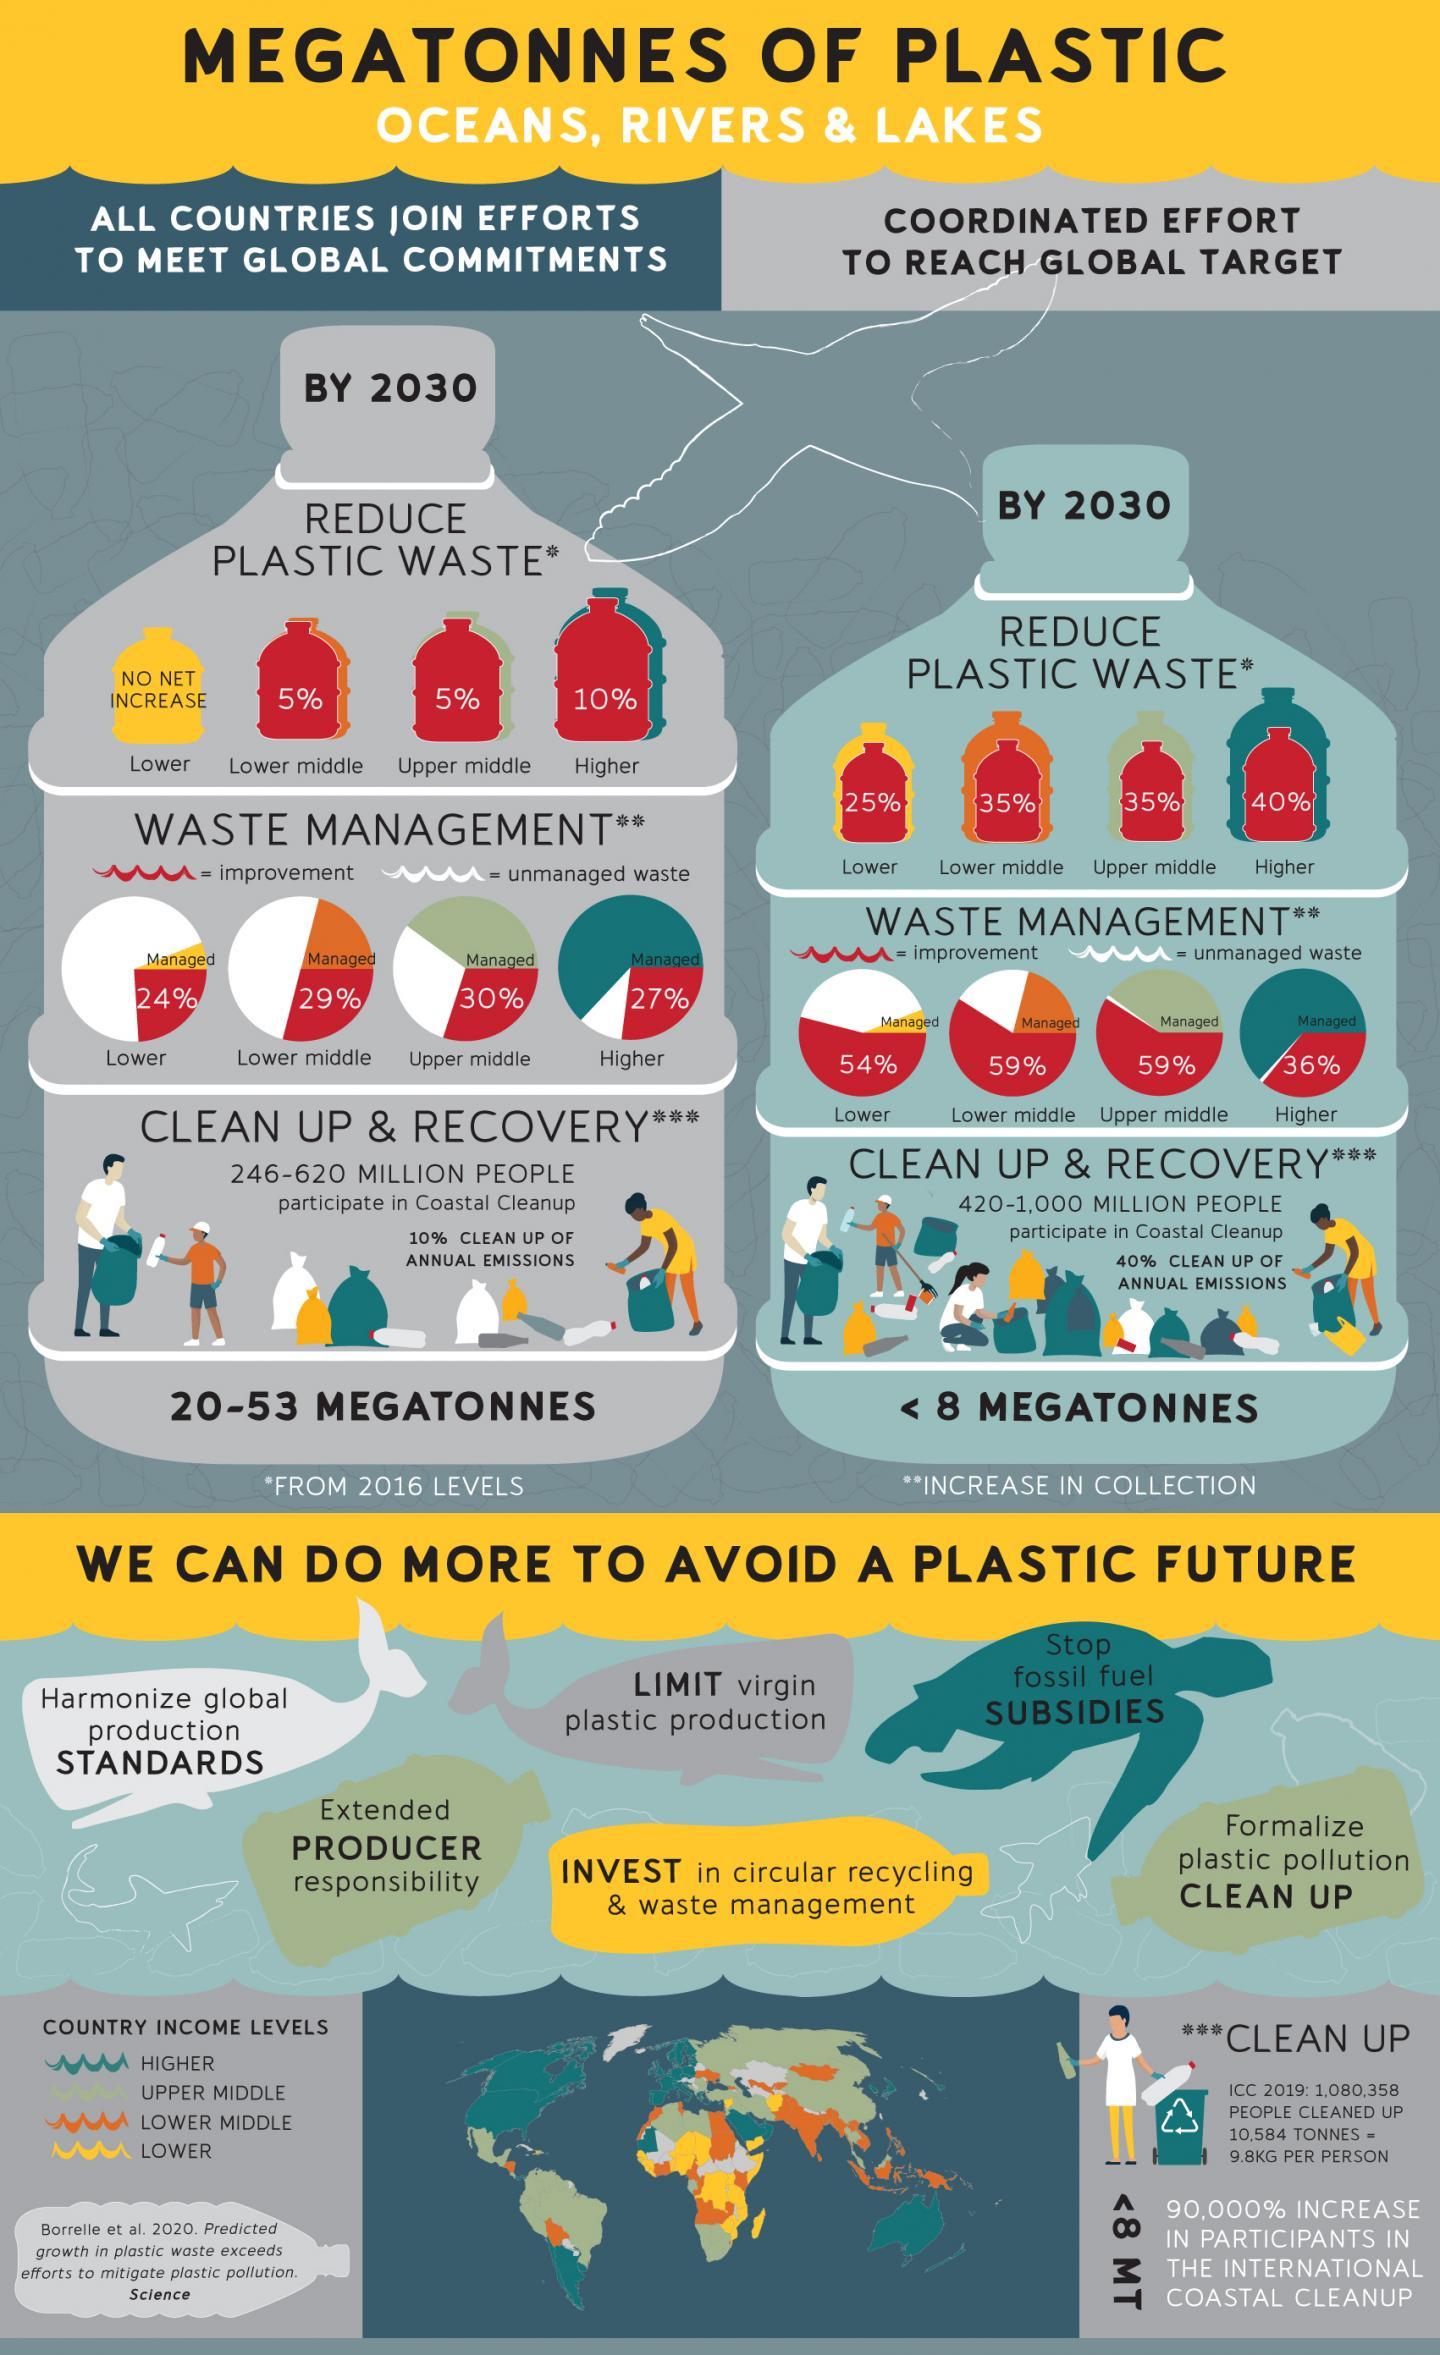 Infographic - Plastic futures and mitigation strategies